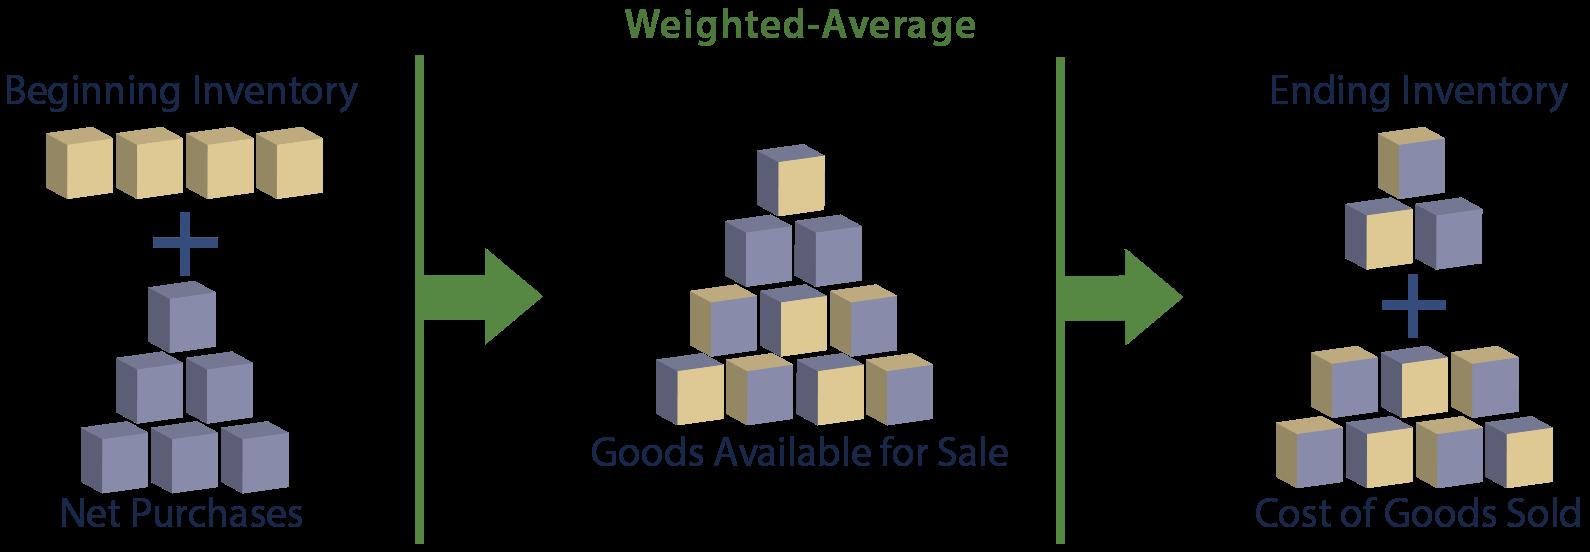 Impact of Beginning Inventory illustration